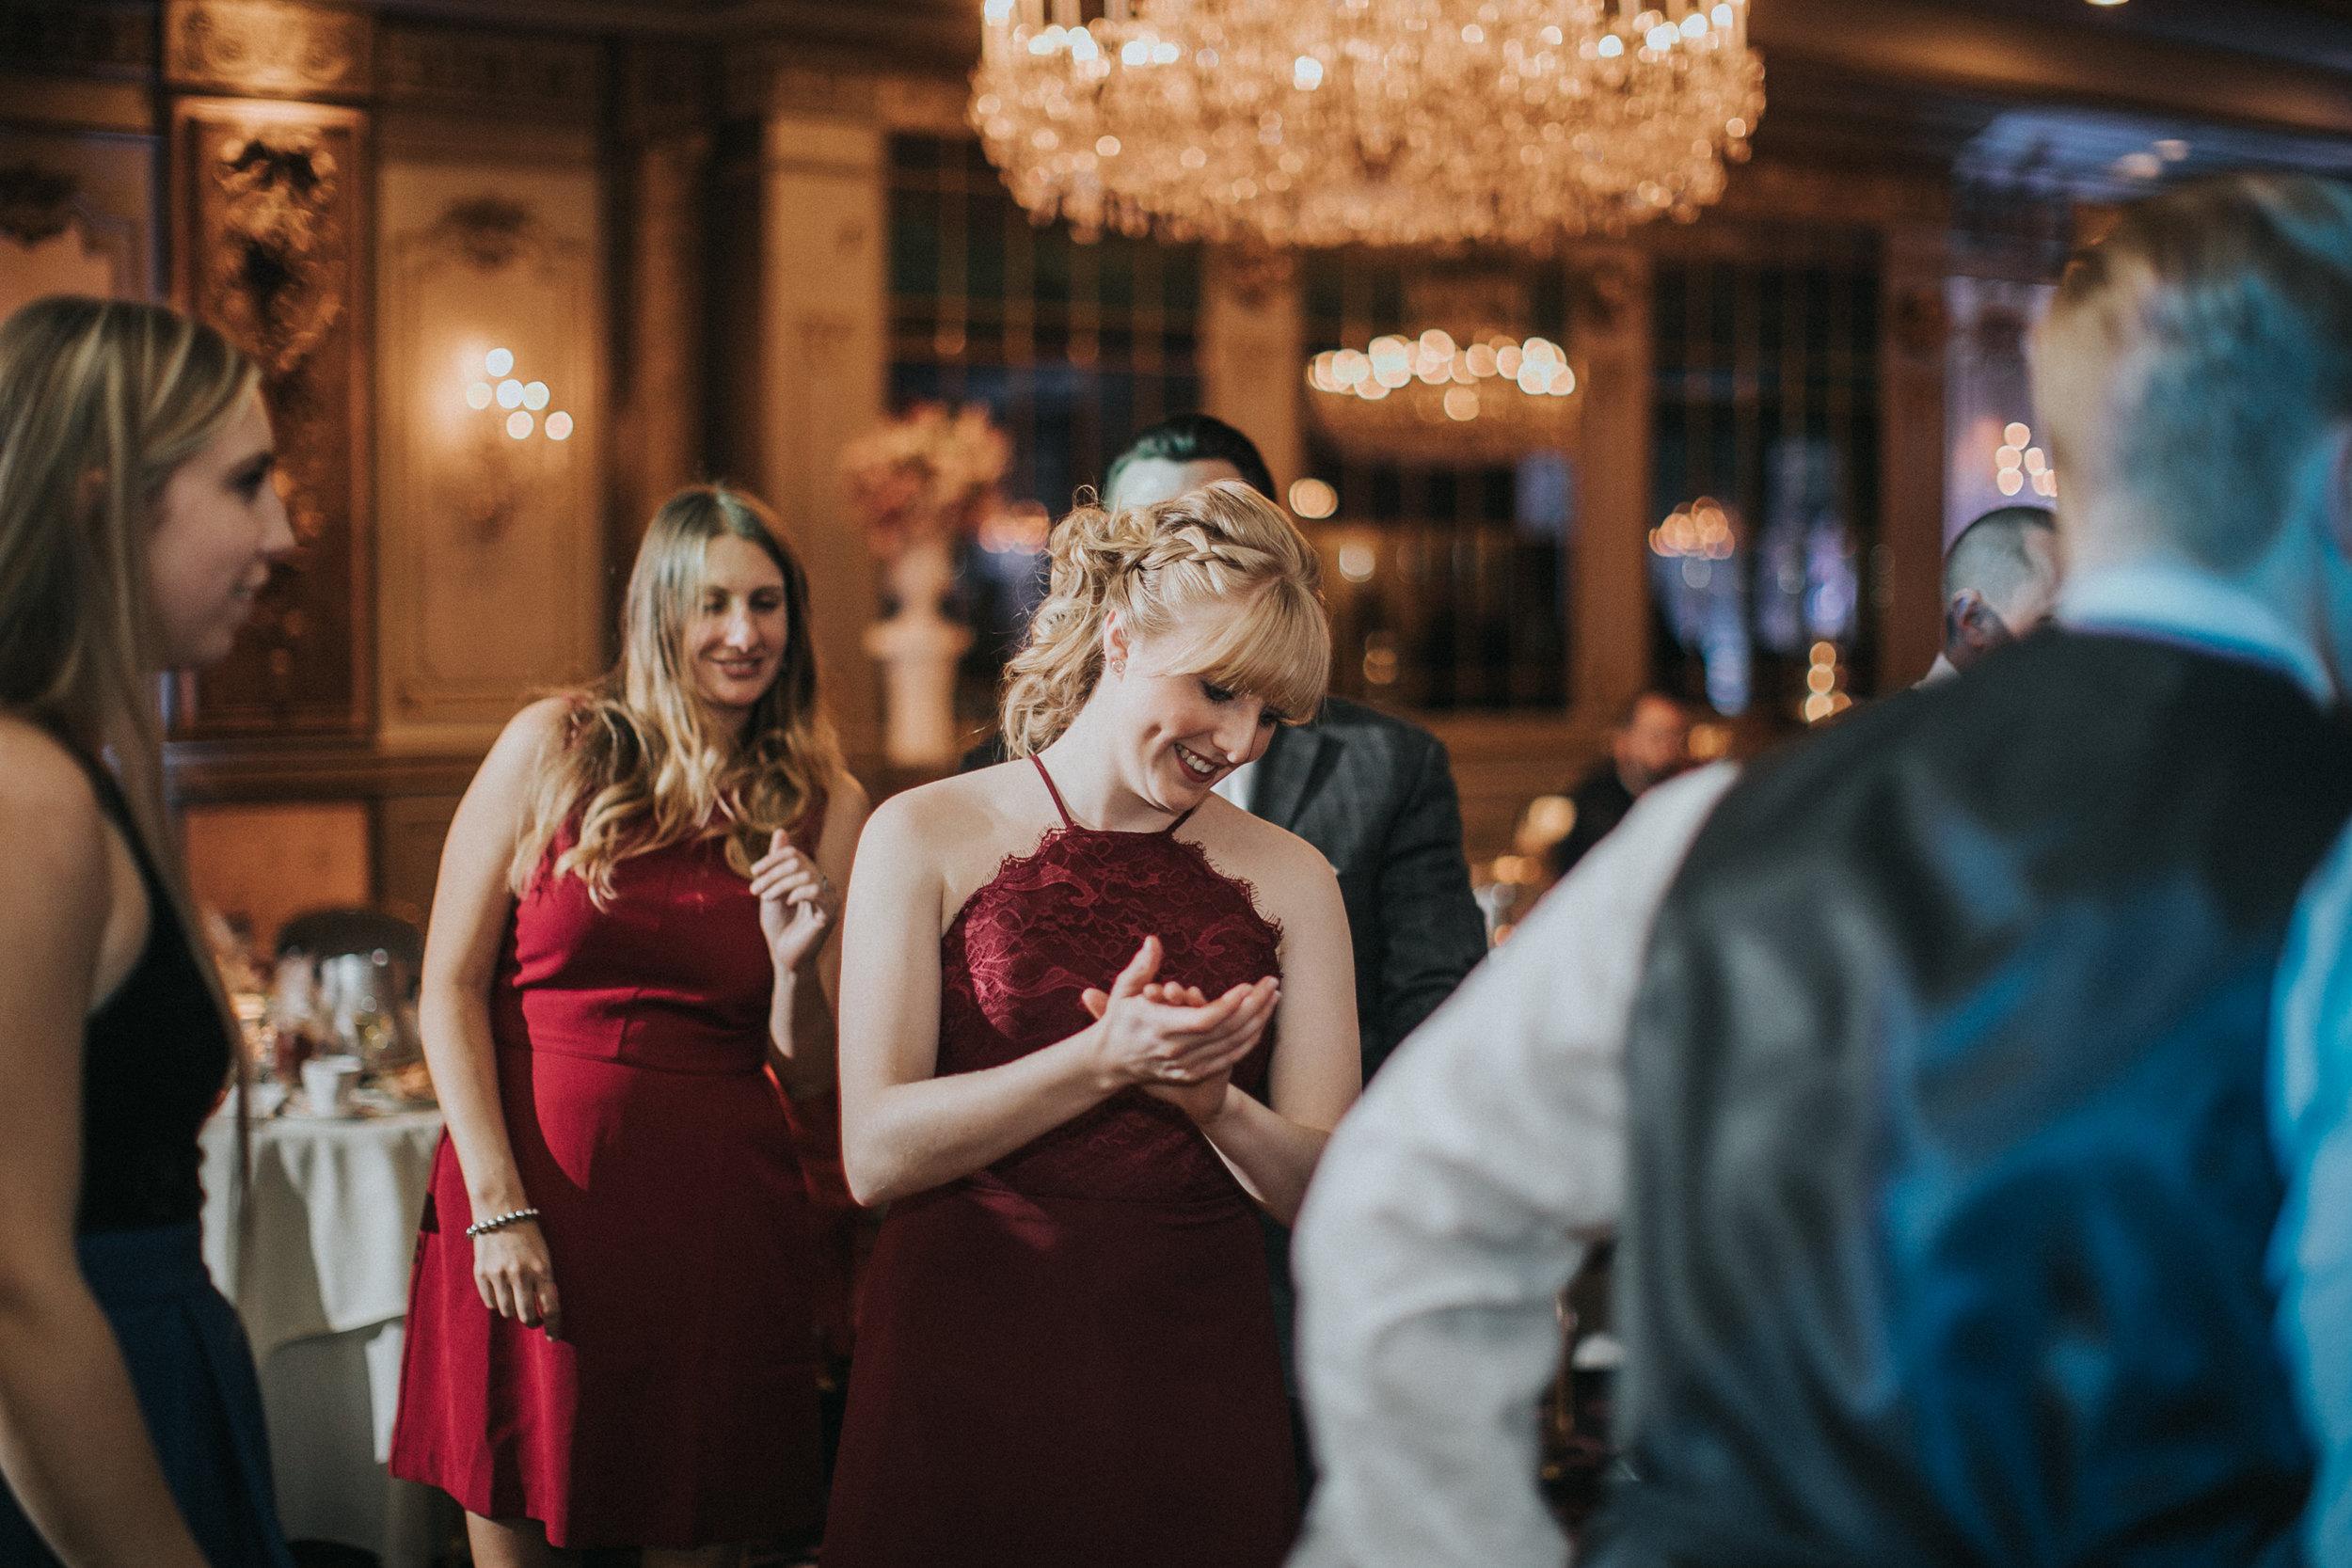 New-Jersey-Wedding-Photography-Fishers-Tudor-House-JennaLynnPhotography-Reception-Kathleen&Eddie-207.jpg